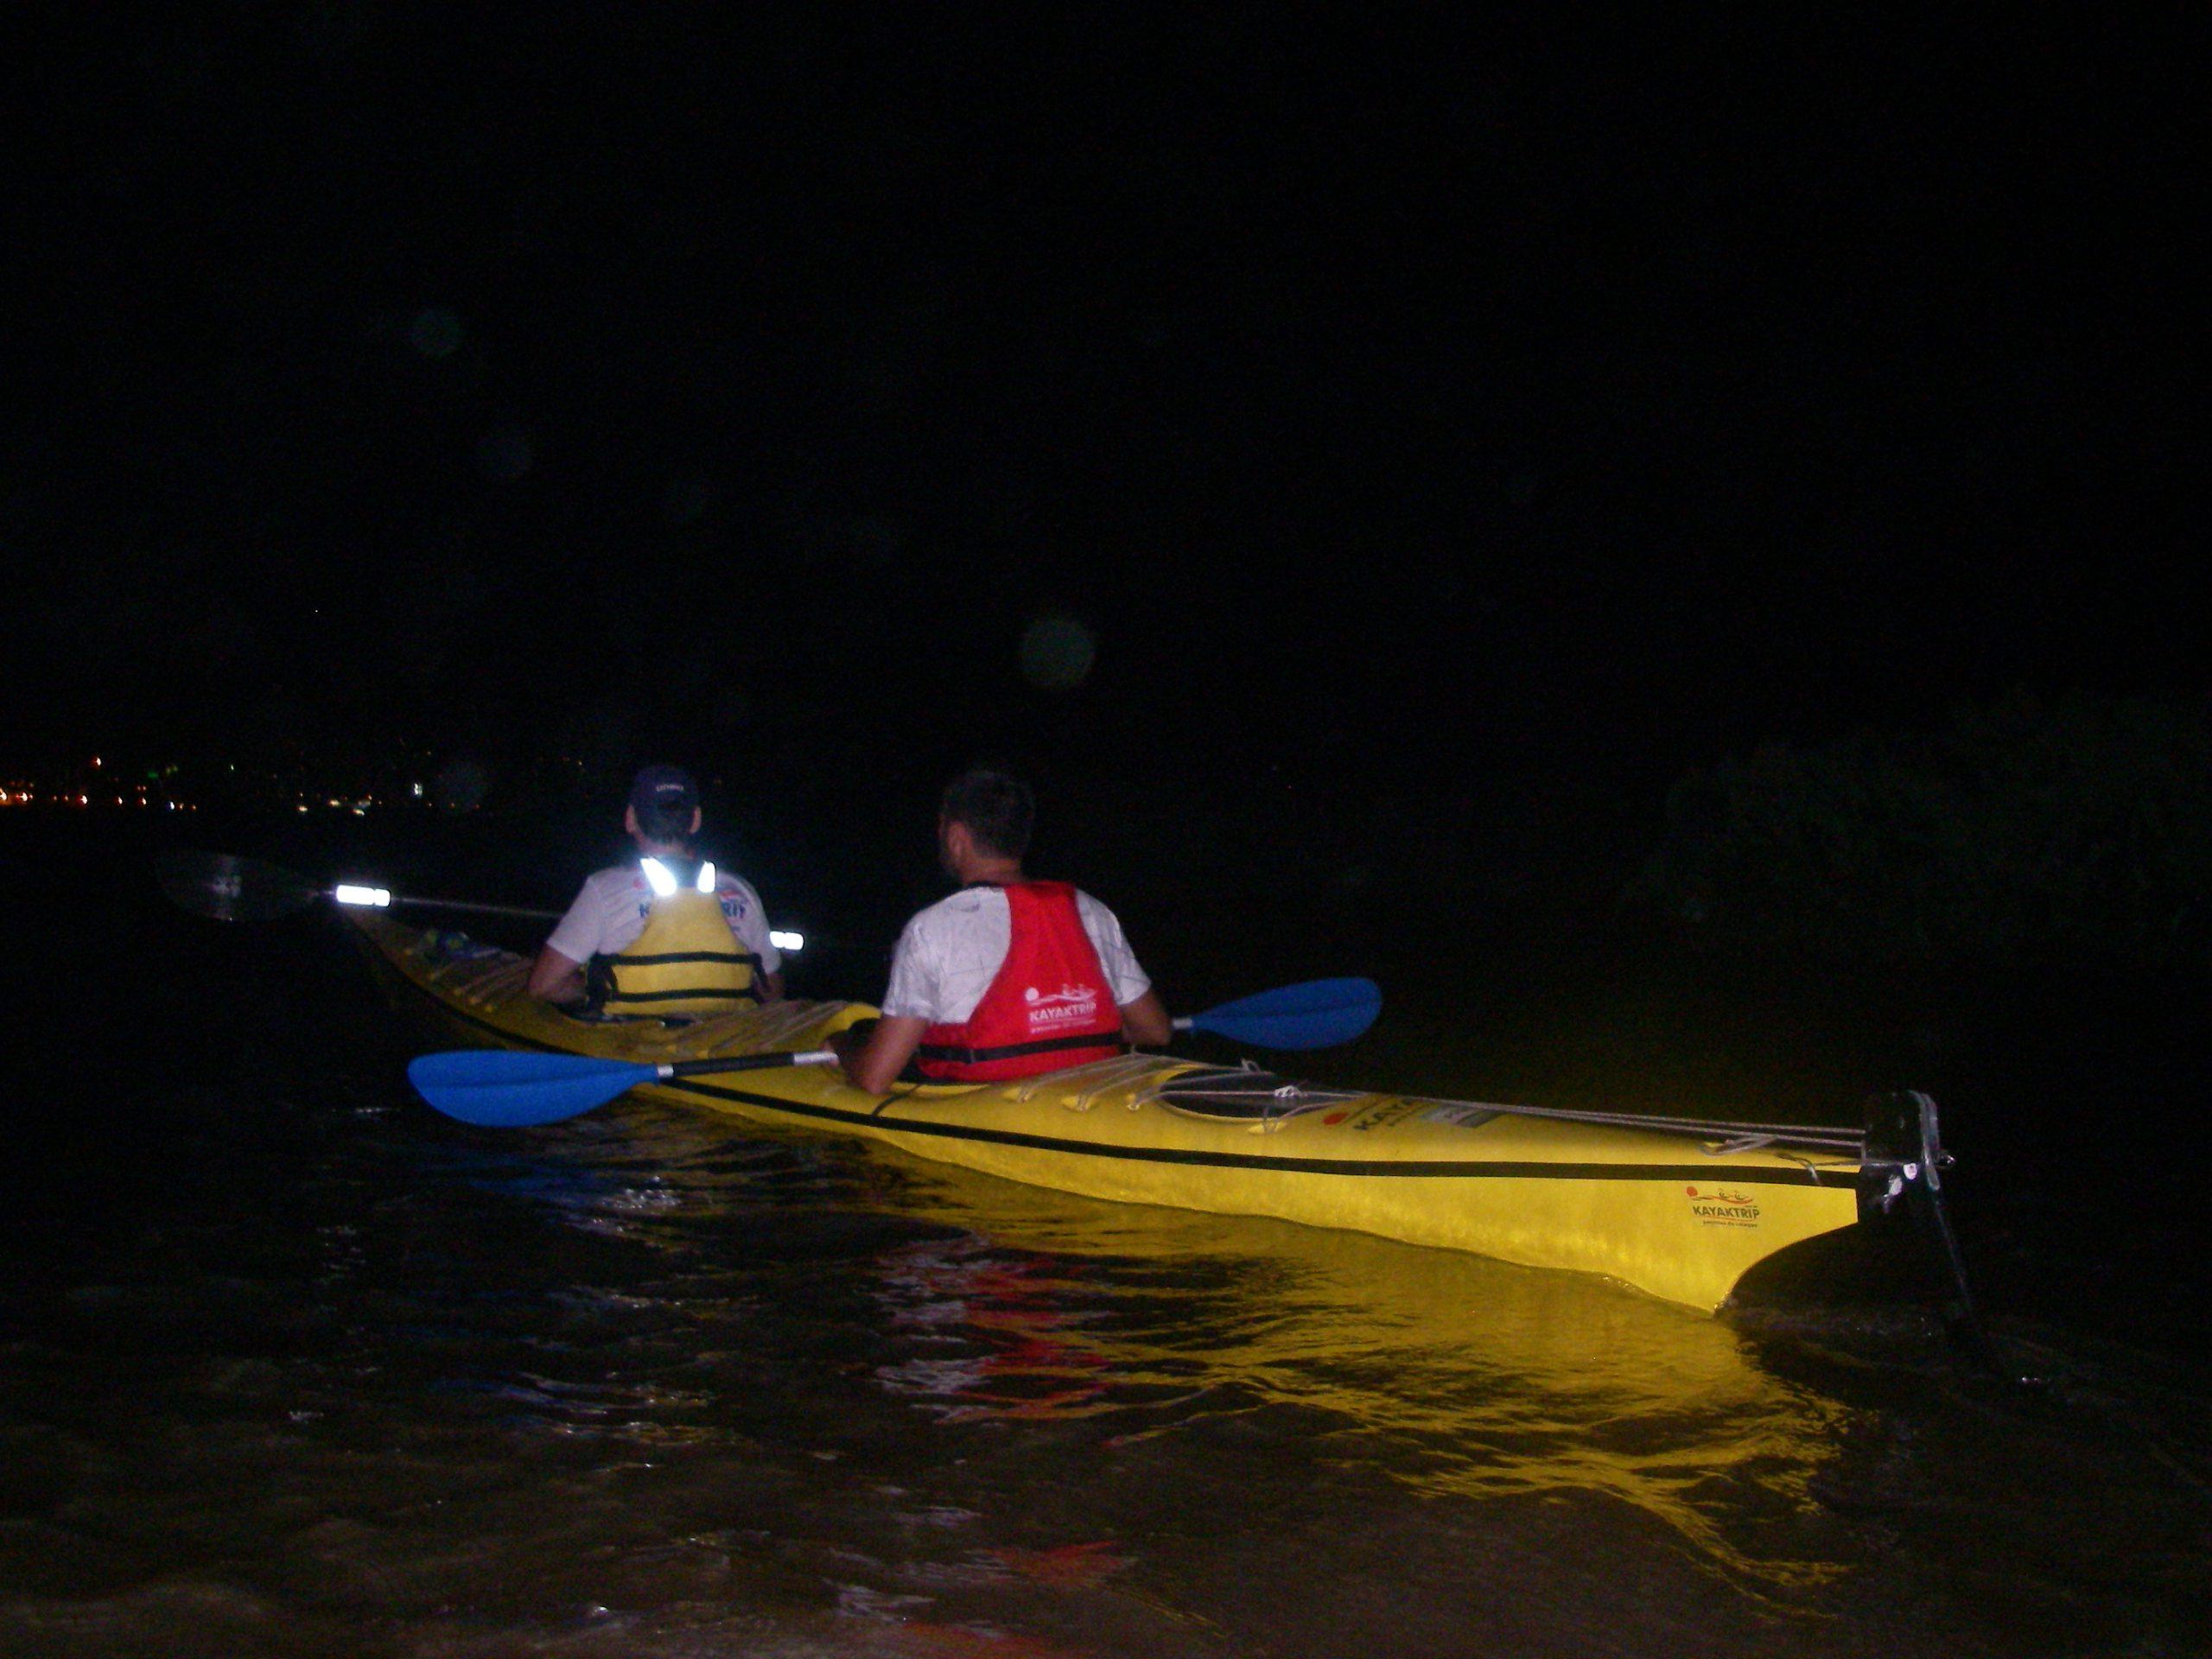 Passeios noturnos de caiaque pelo Guaíba - kayaktrip